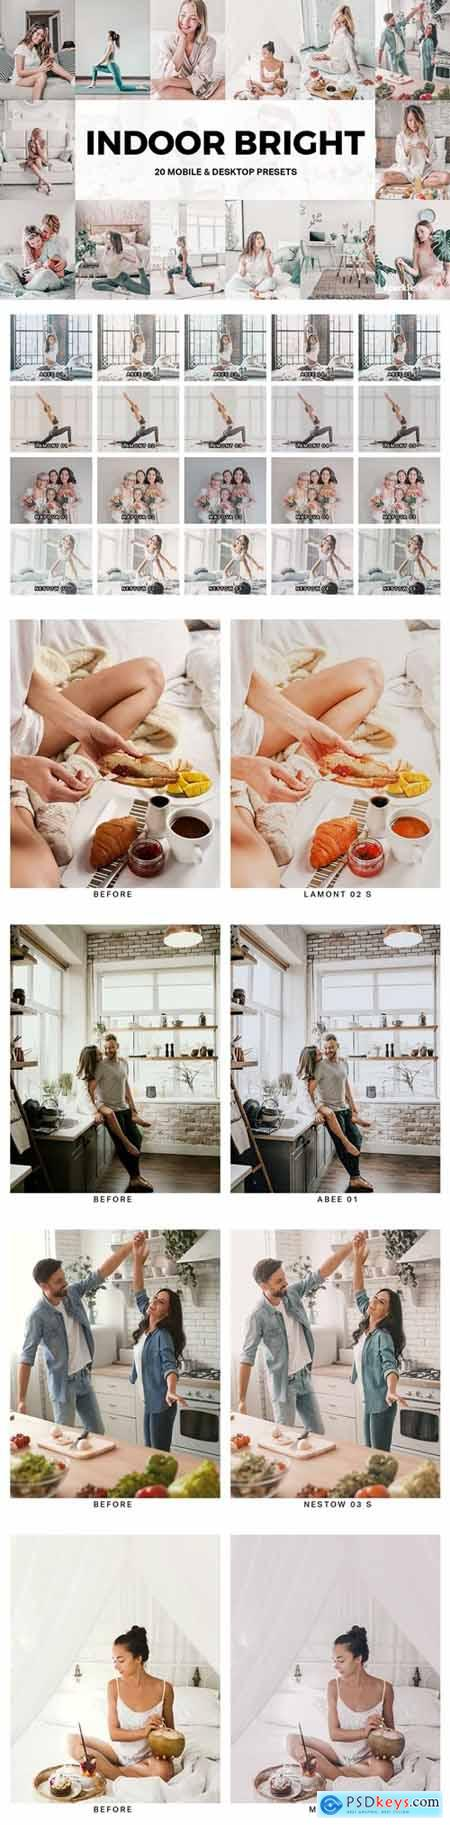 20 Indoor Bright Lightroom Presets and LUTs